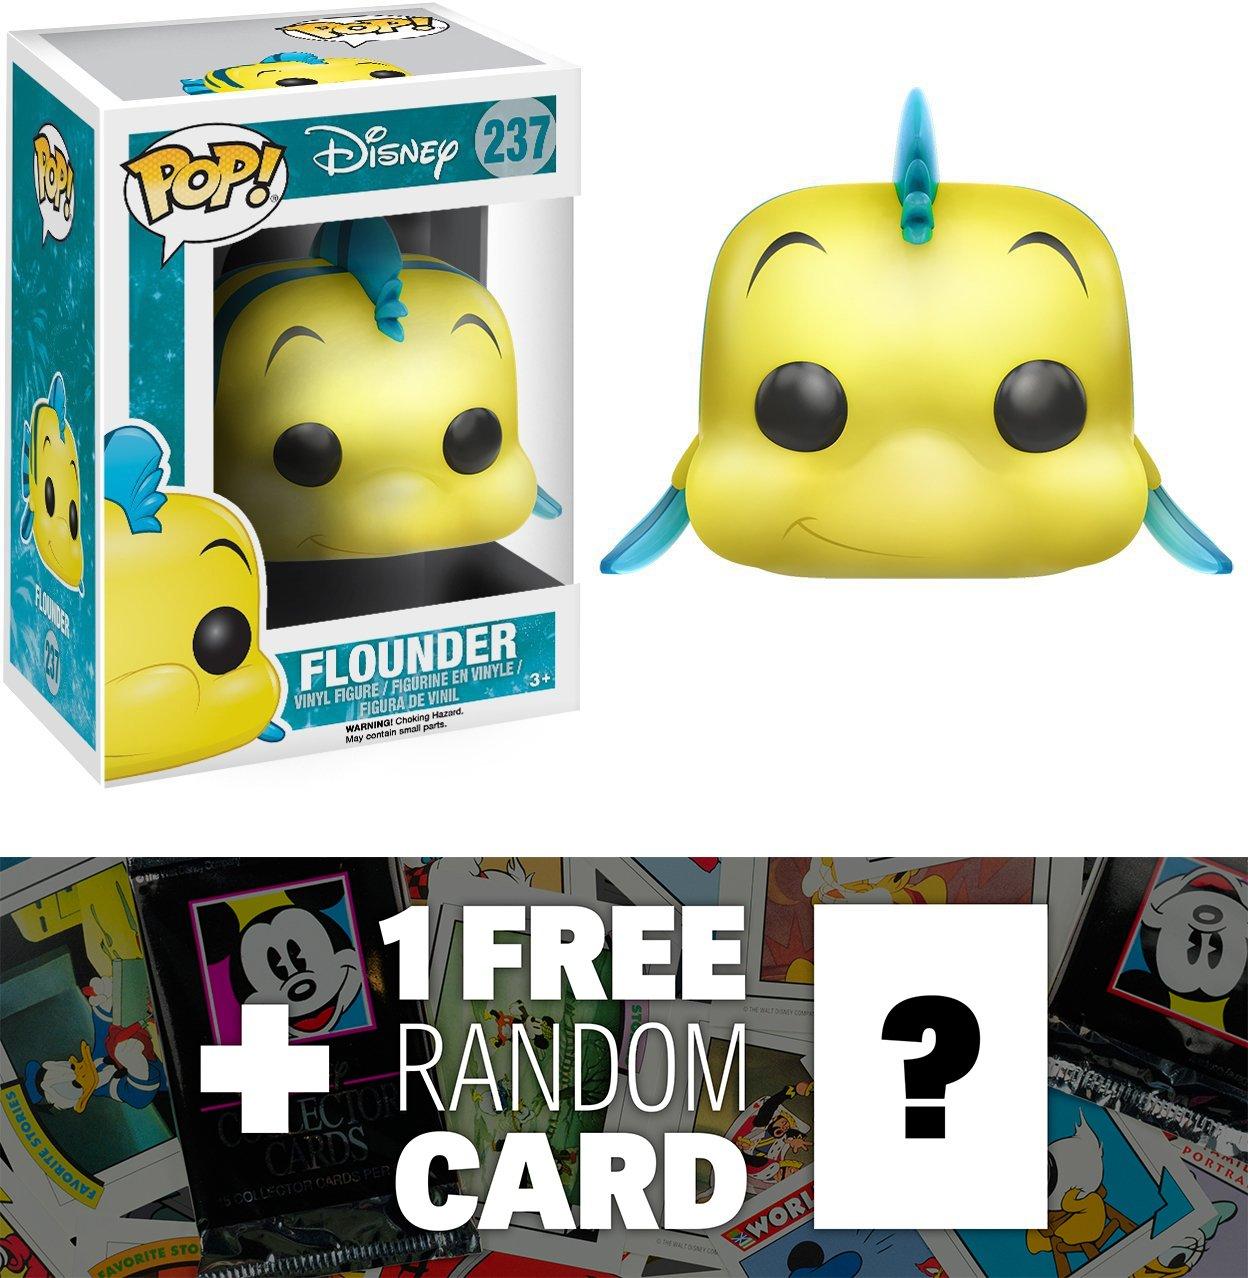 x Disney The Little Mermaid Vinyl Figure Flounder: Funko POP BCC94GZ9 1 FREE Classic Disney Trading Card Bundle 117388